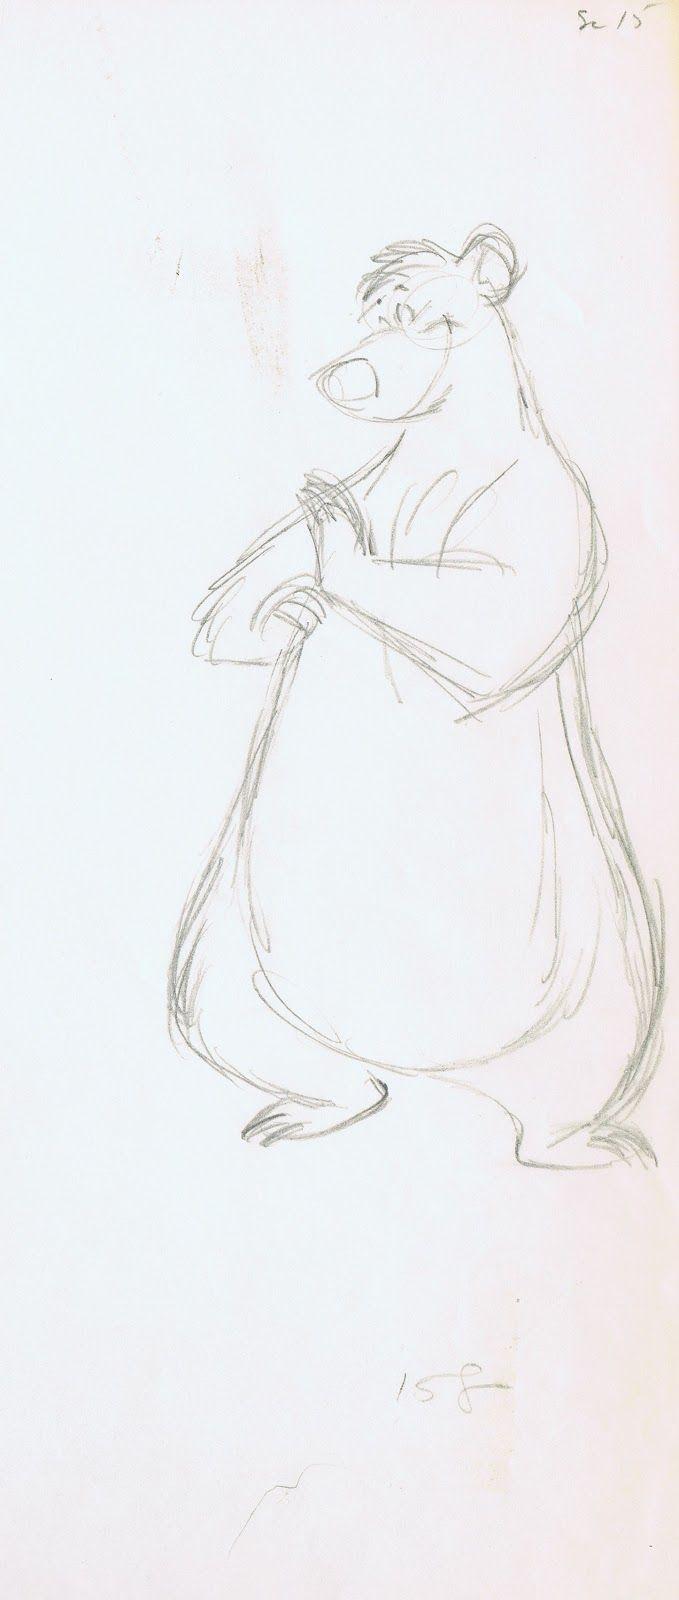 Drawn amour jungle Balloo Disney all Pinterest Jungle